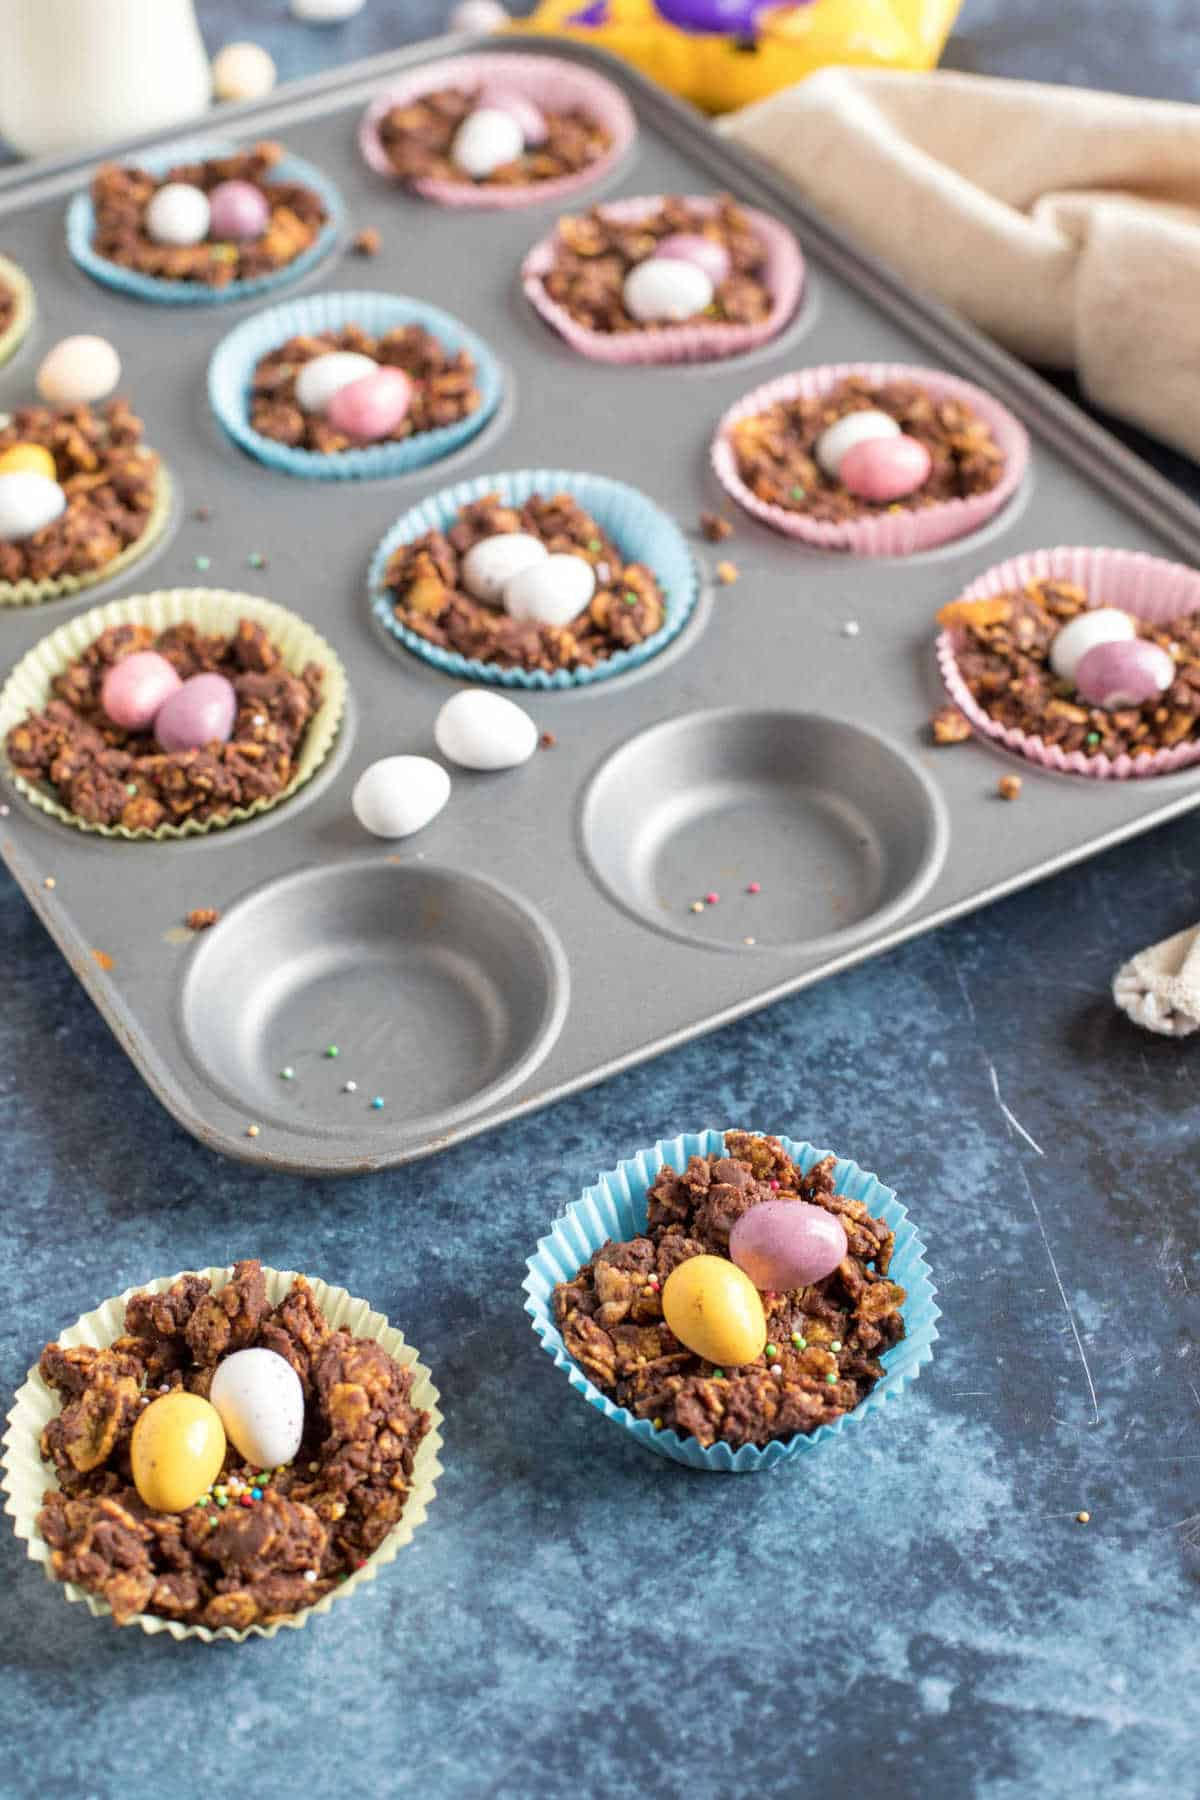 Cornflake cakes with mini eggs.